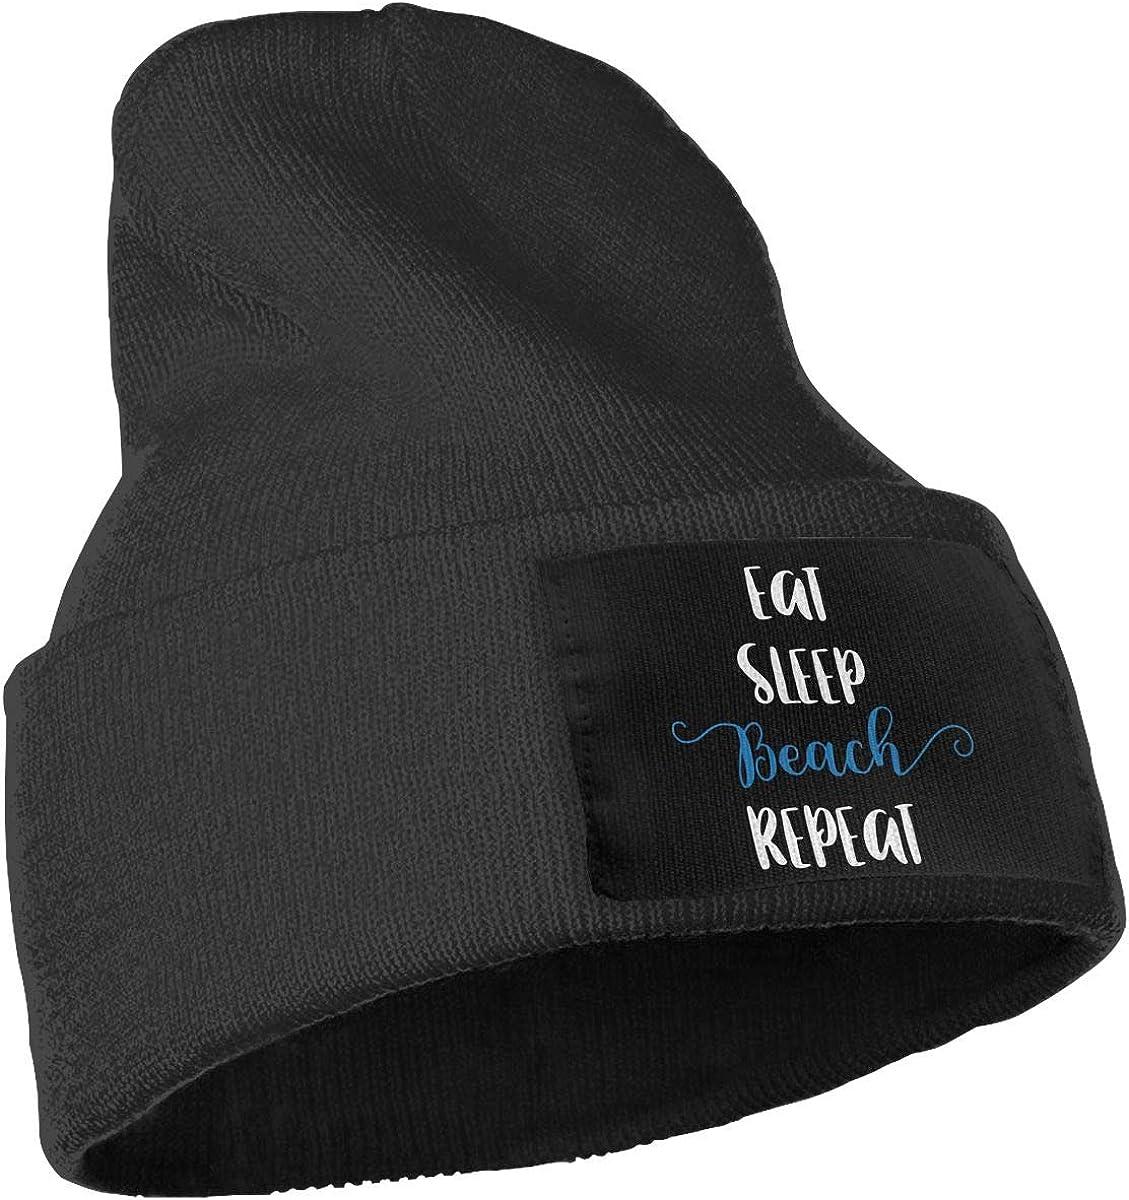 COLLJL-8 Men /& Women Eat Sleep Beach Repeat Outdoor Fashion Knit Beanies Hat Soft Winter Knit Caps